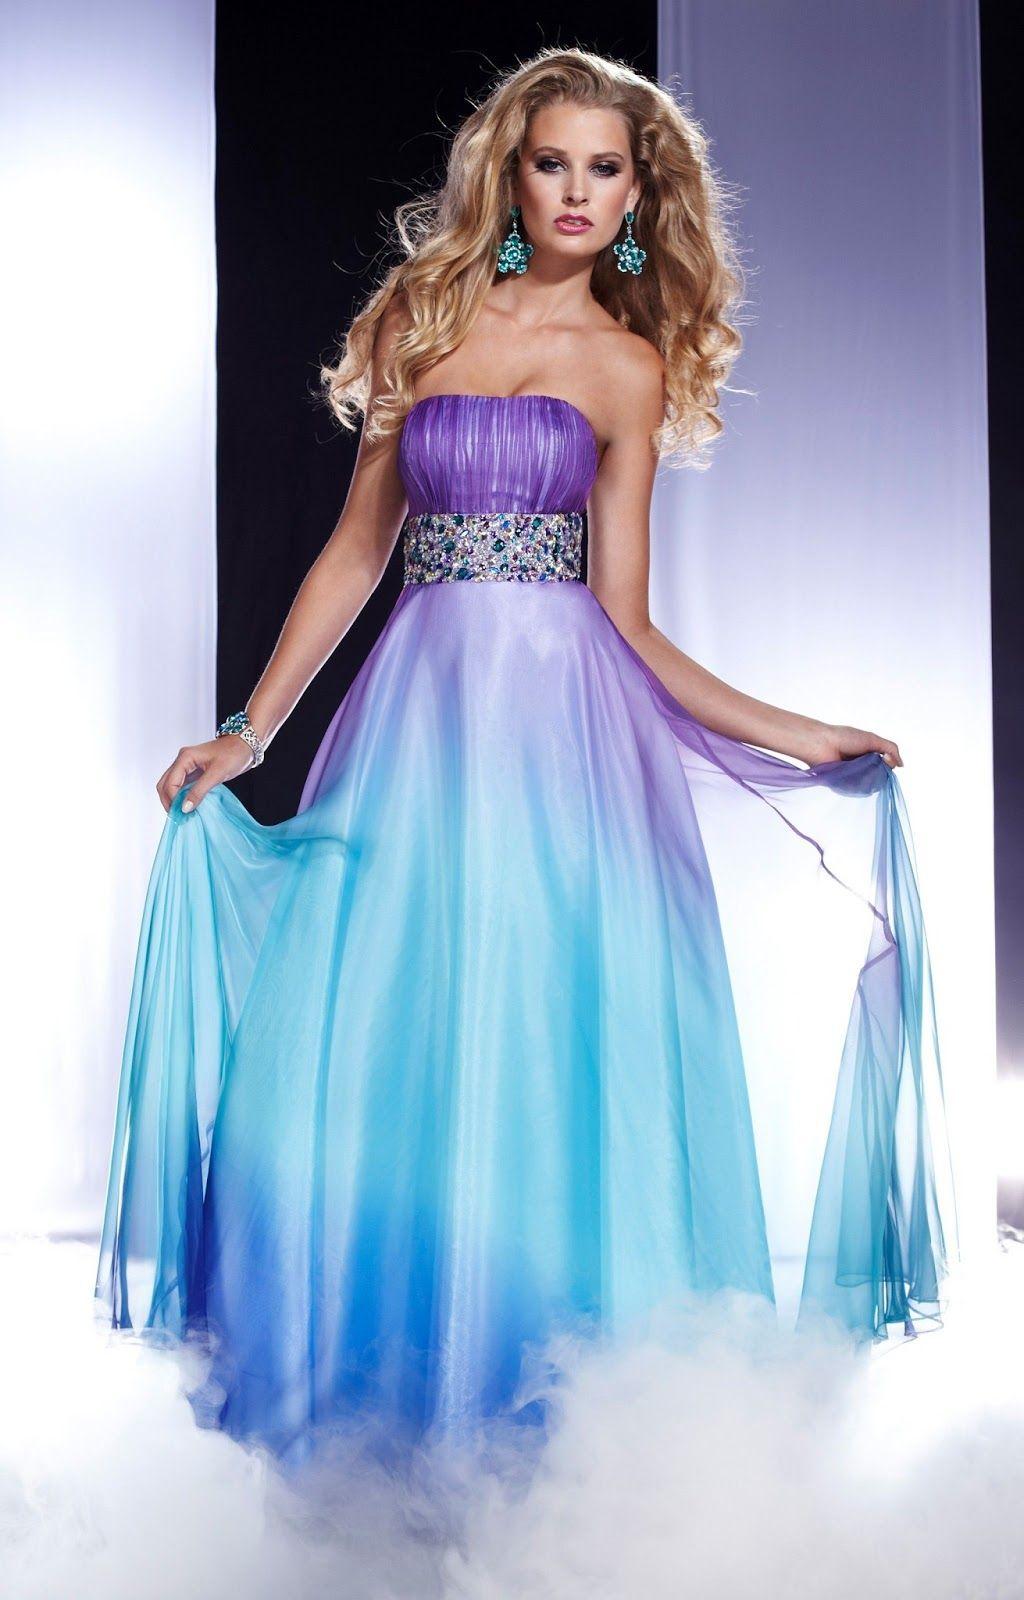 Love this prom dress blue and purple | dresses | Pinterest | Dress ...